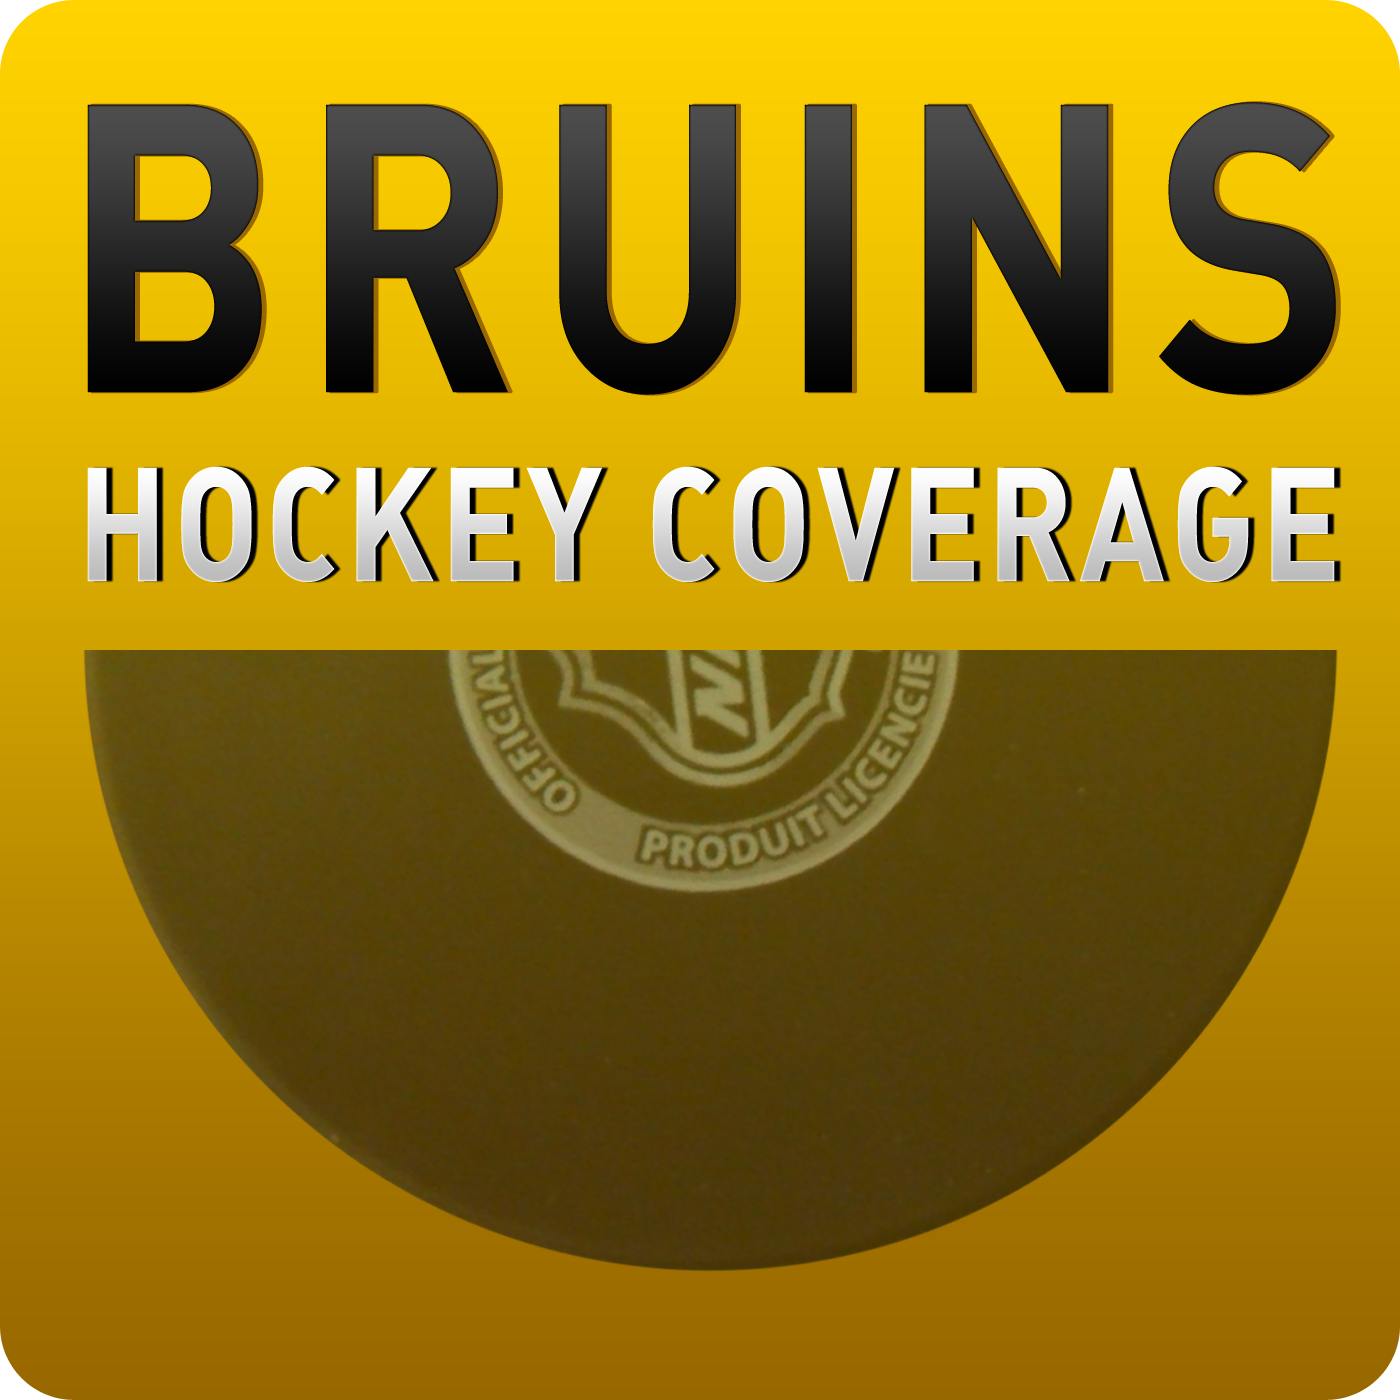 Boston Bruins Hockey